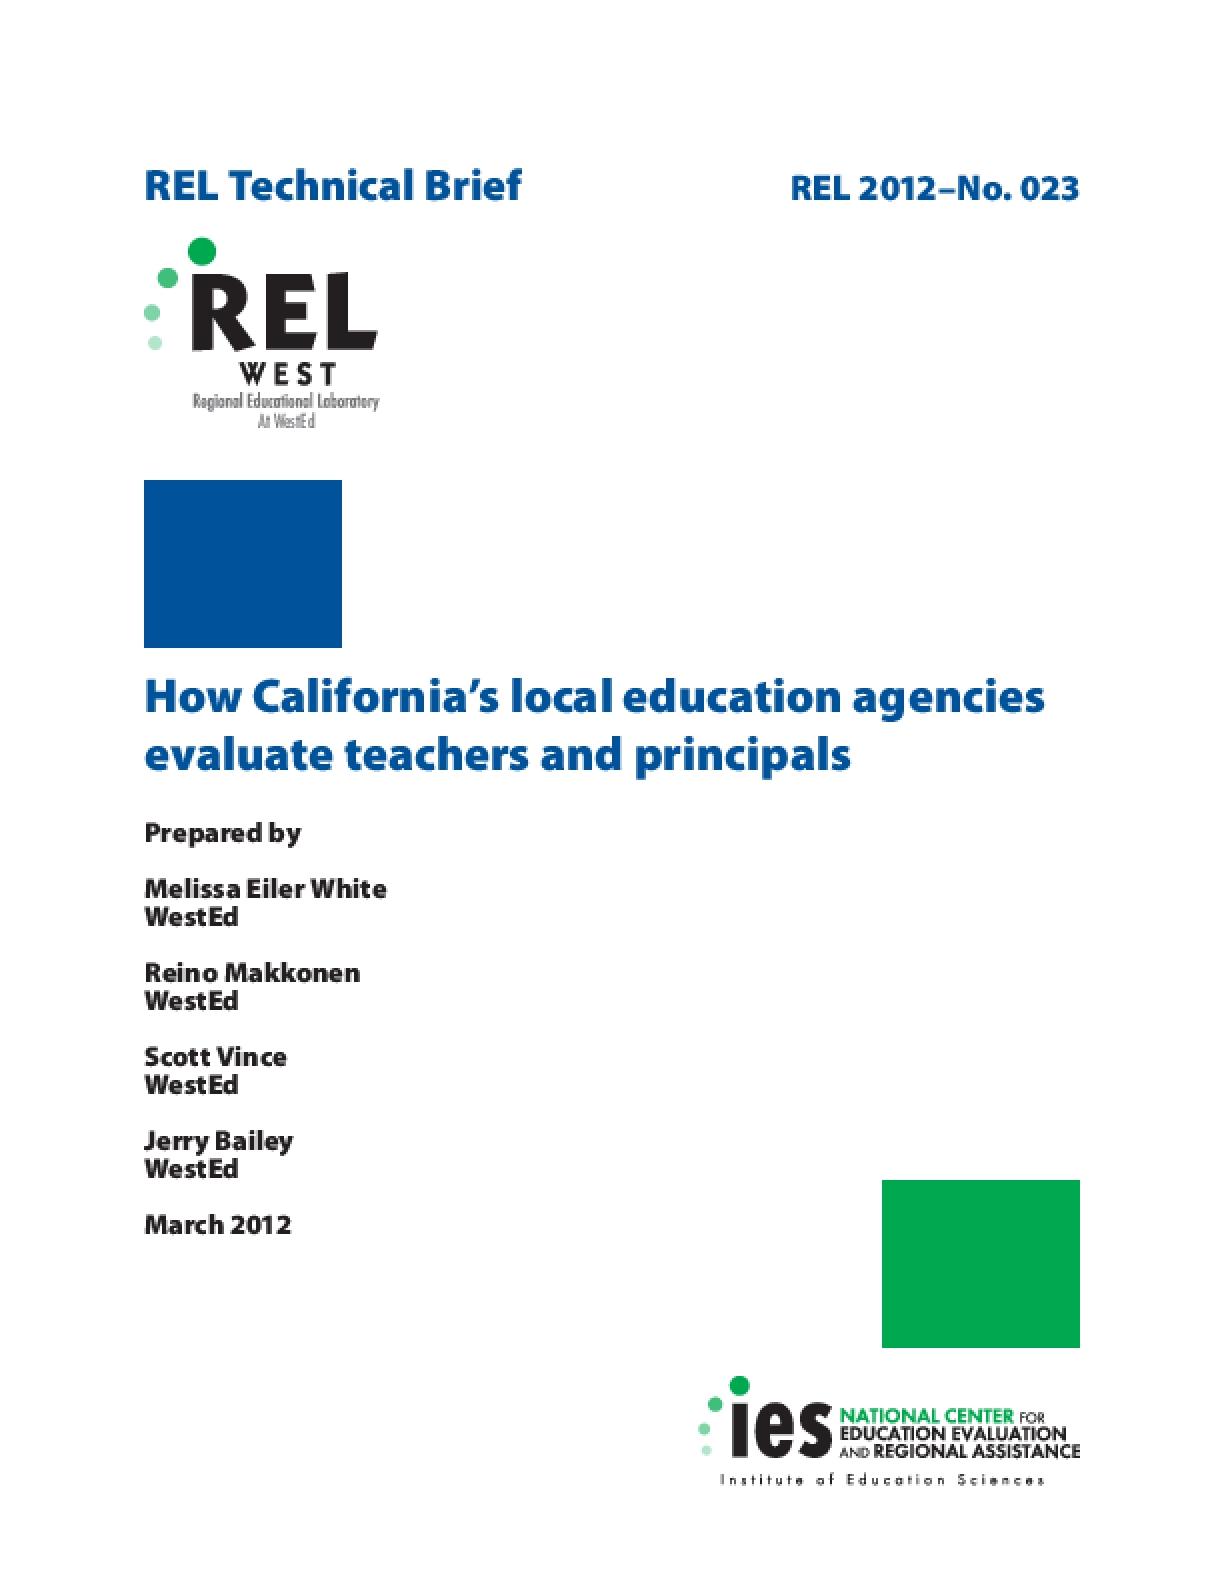 How California's Local Education Agencies Evaluate Teachers and Principals